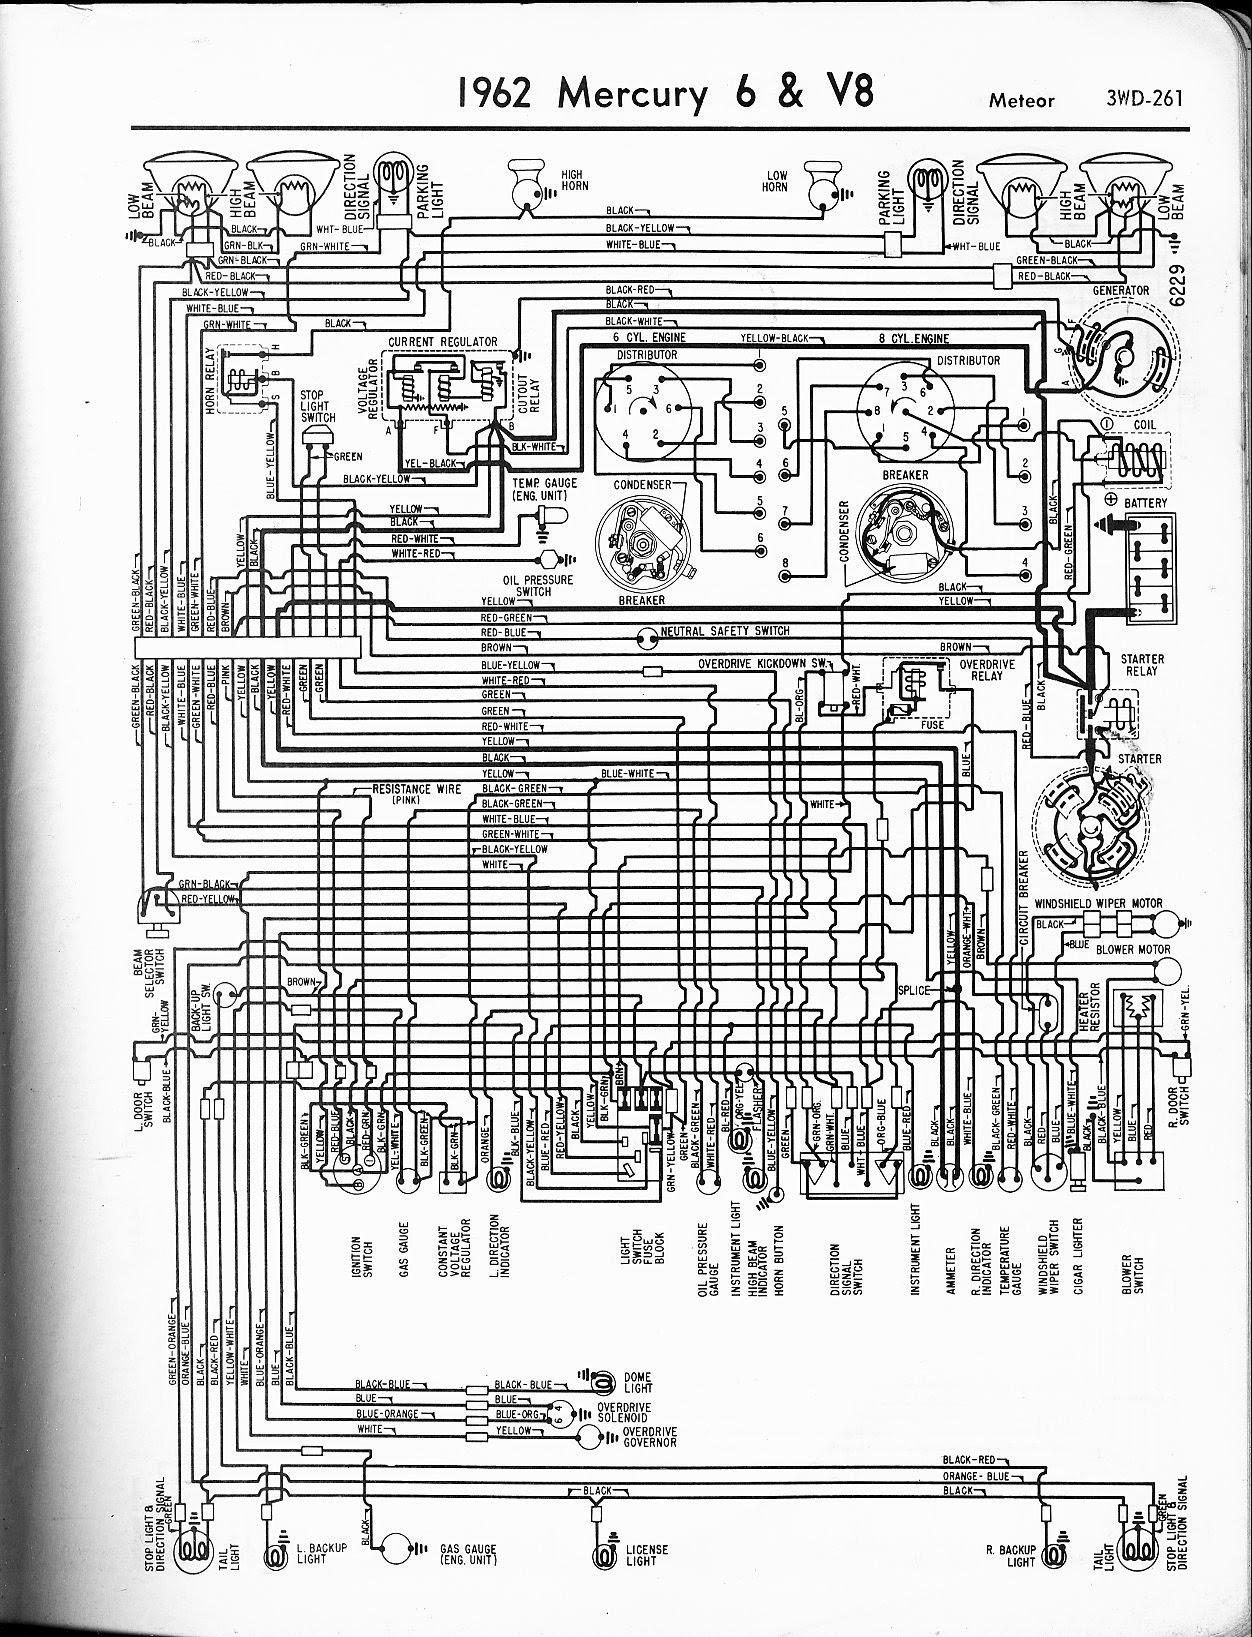 1969 Mercury Cyclone Wiring Diagram C F L Circuit Diagram Camrysdes Queso Madfish It